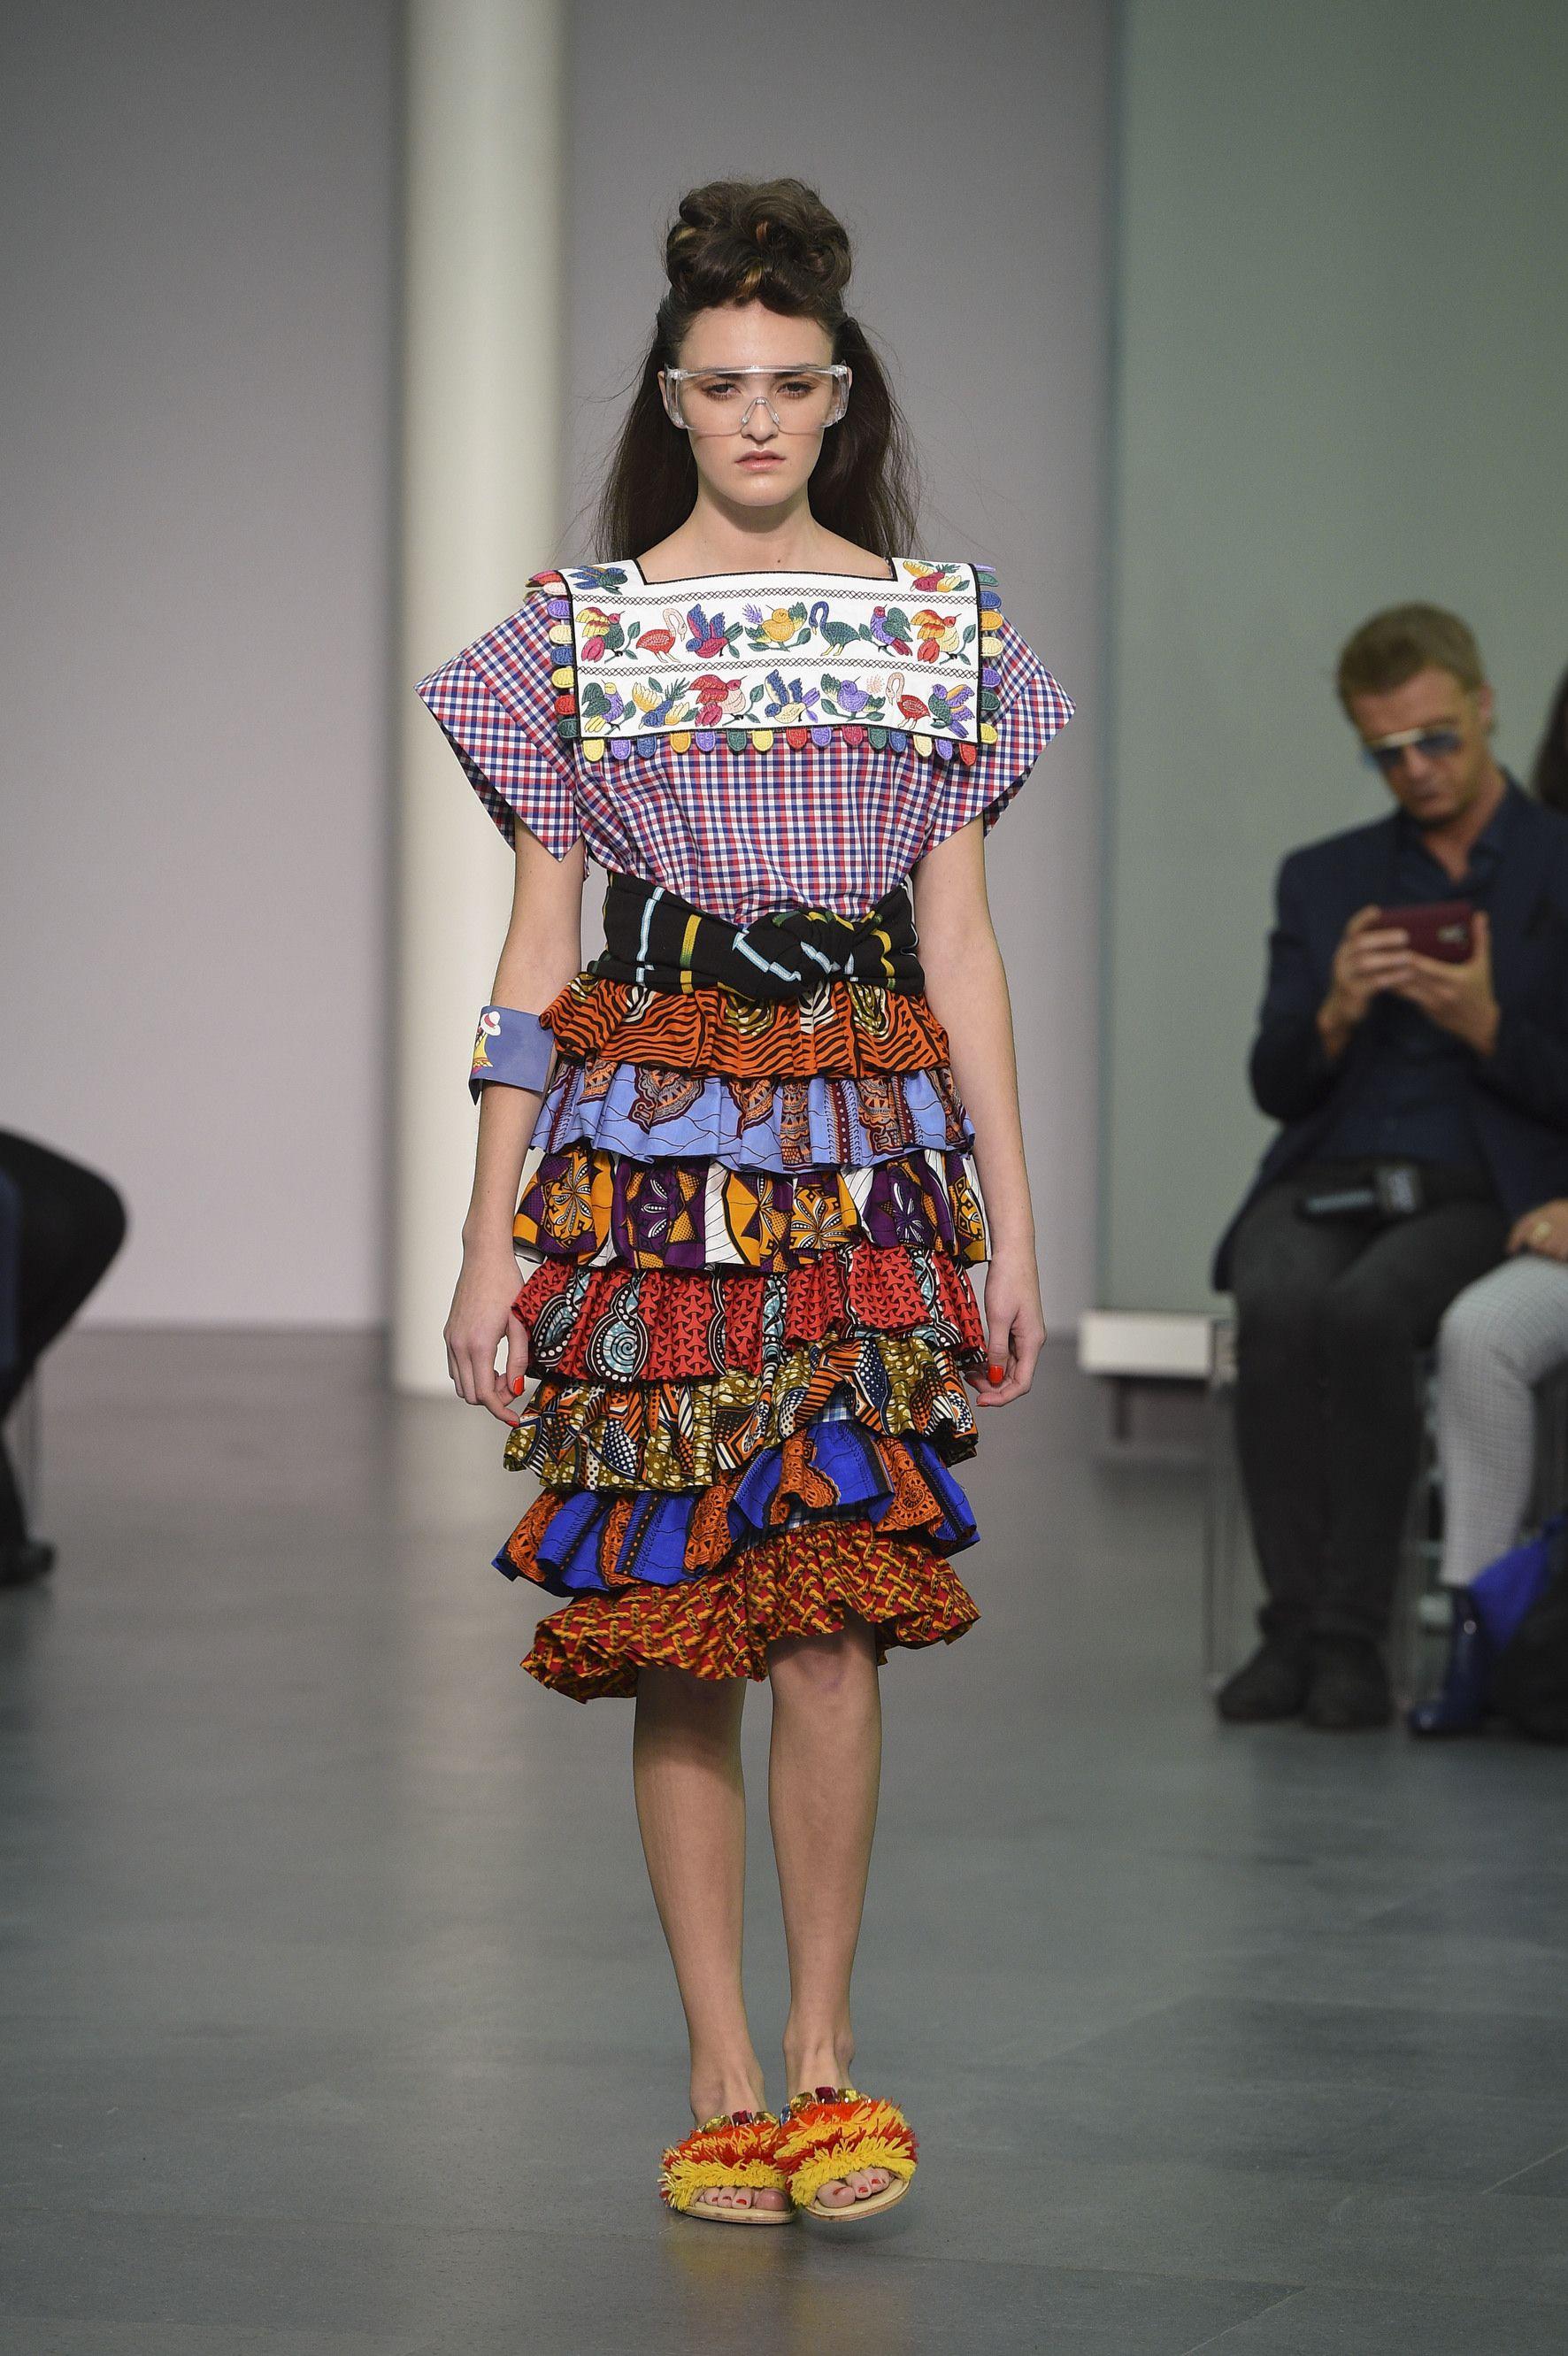 Stella Jean SS 16 Womenswear collection! #StellaJean #SS16 #SpringSummer16 #EthicallyMade #EthicallyEnvisioned #EthicalFashion #MigrantIdentity #MMD #CNMI #MFW #Fashion #FashionWeek #MUDEC #CameraNazionaledellaModa